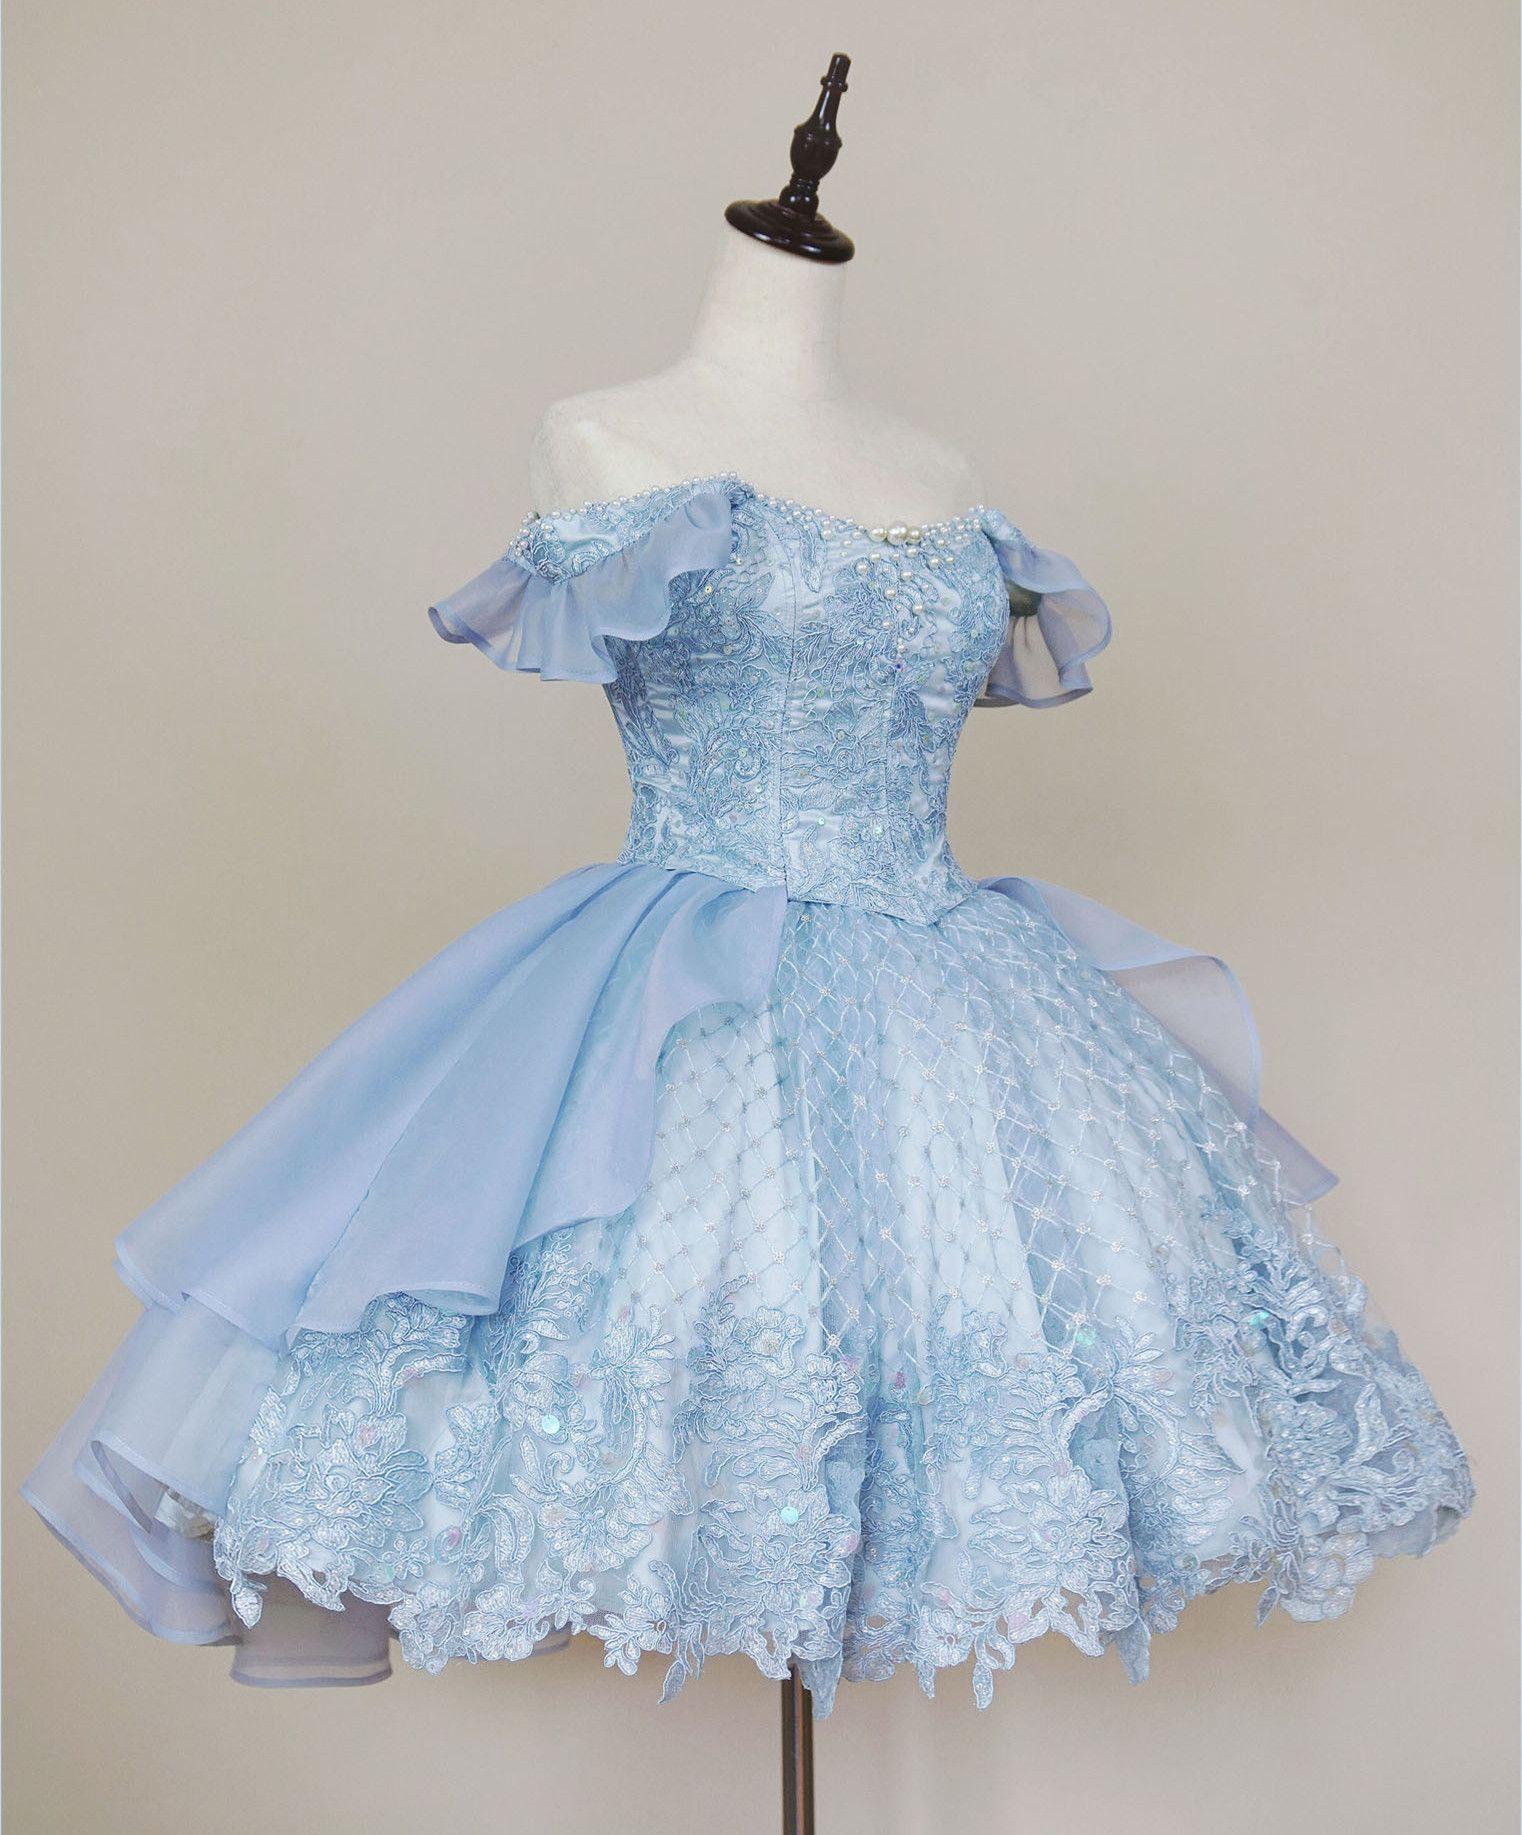 White Classic Lolita Dress White Wedding Dress White Lolita Dress Vintage White Chiffon Dress With Lace and Navy Blue Ribbon